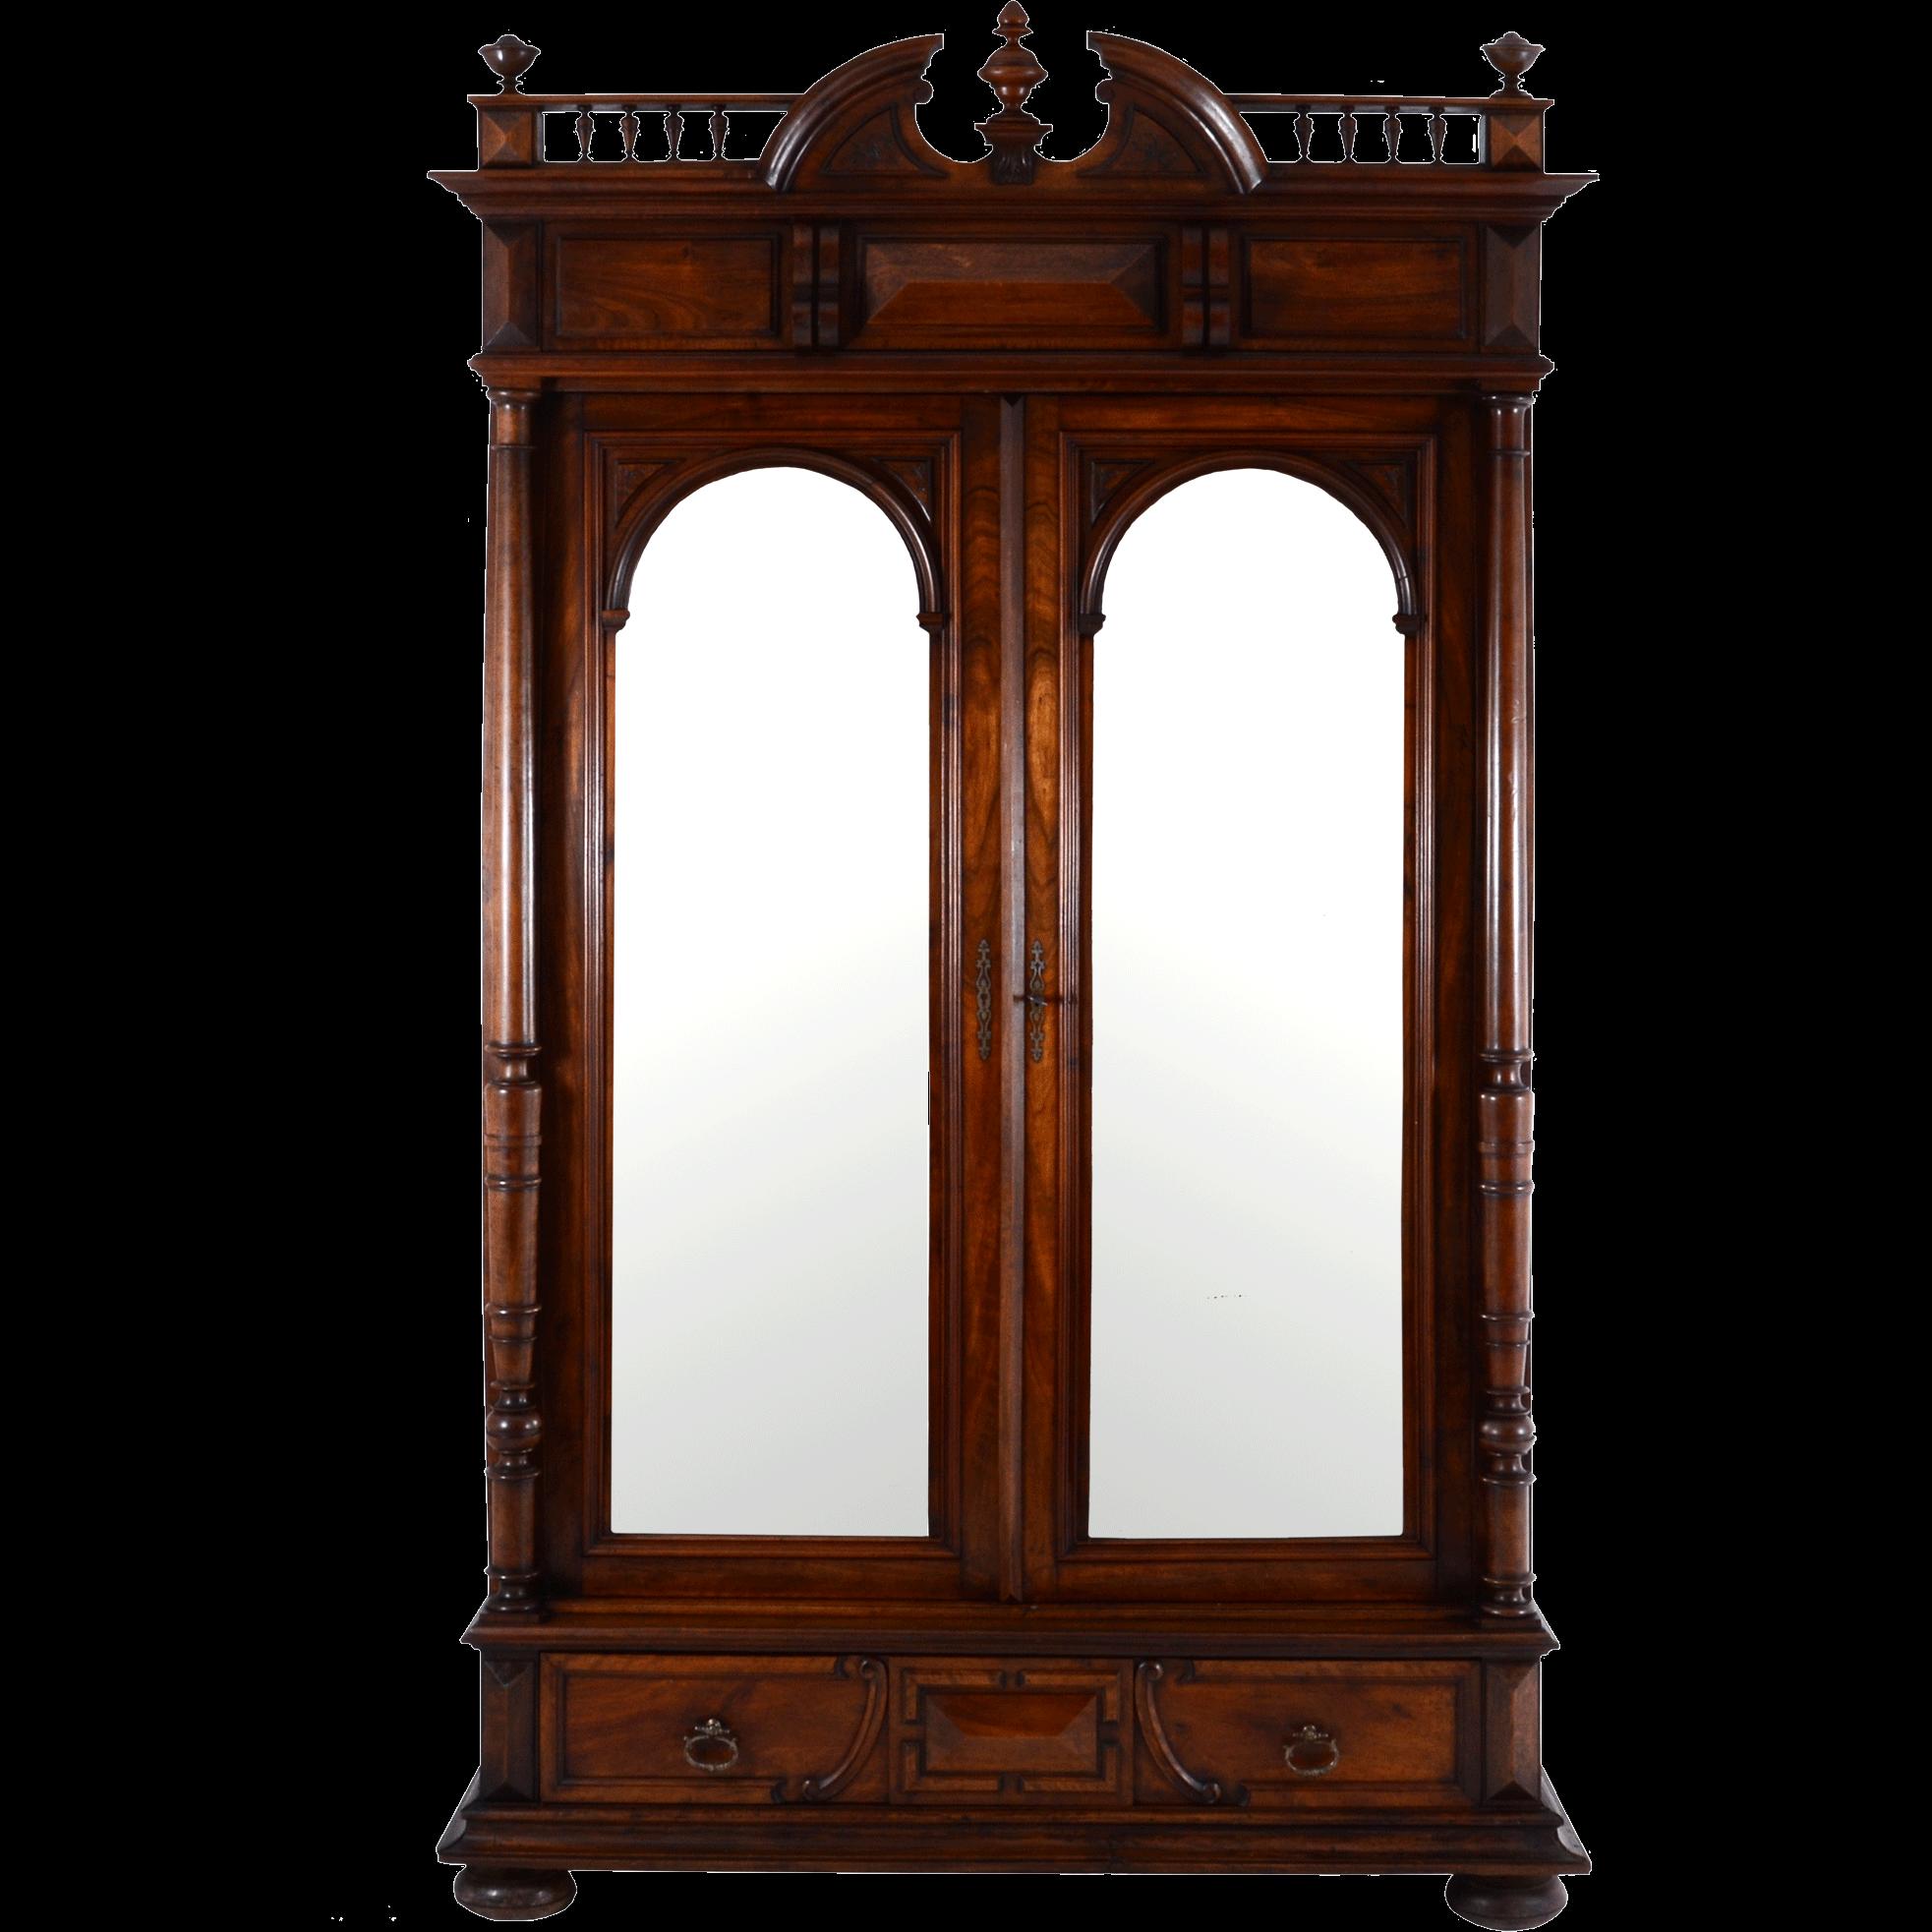 French Mirrored Two Door Walnut Wardrobe